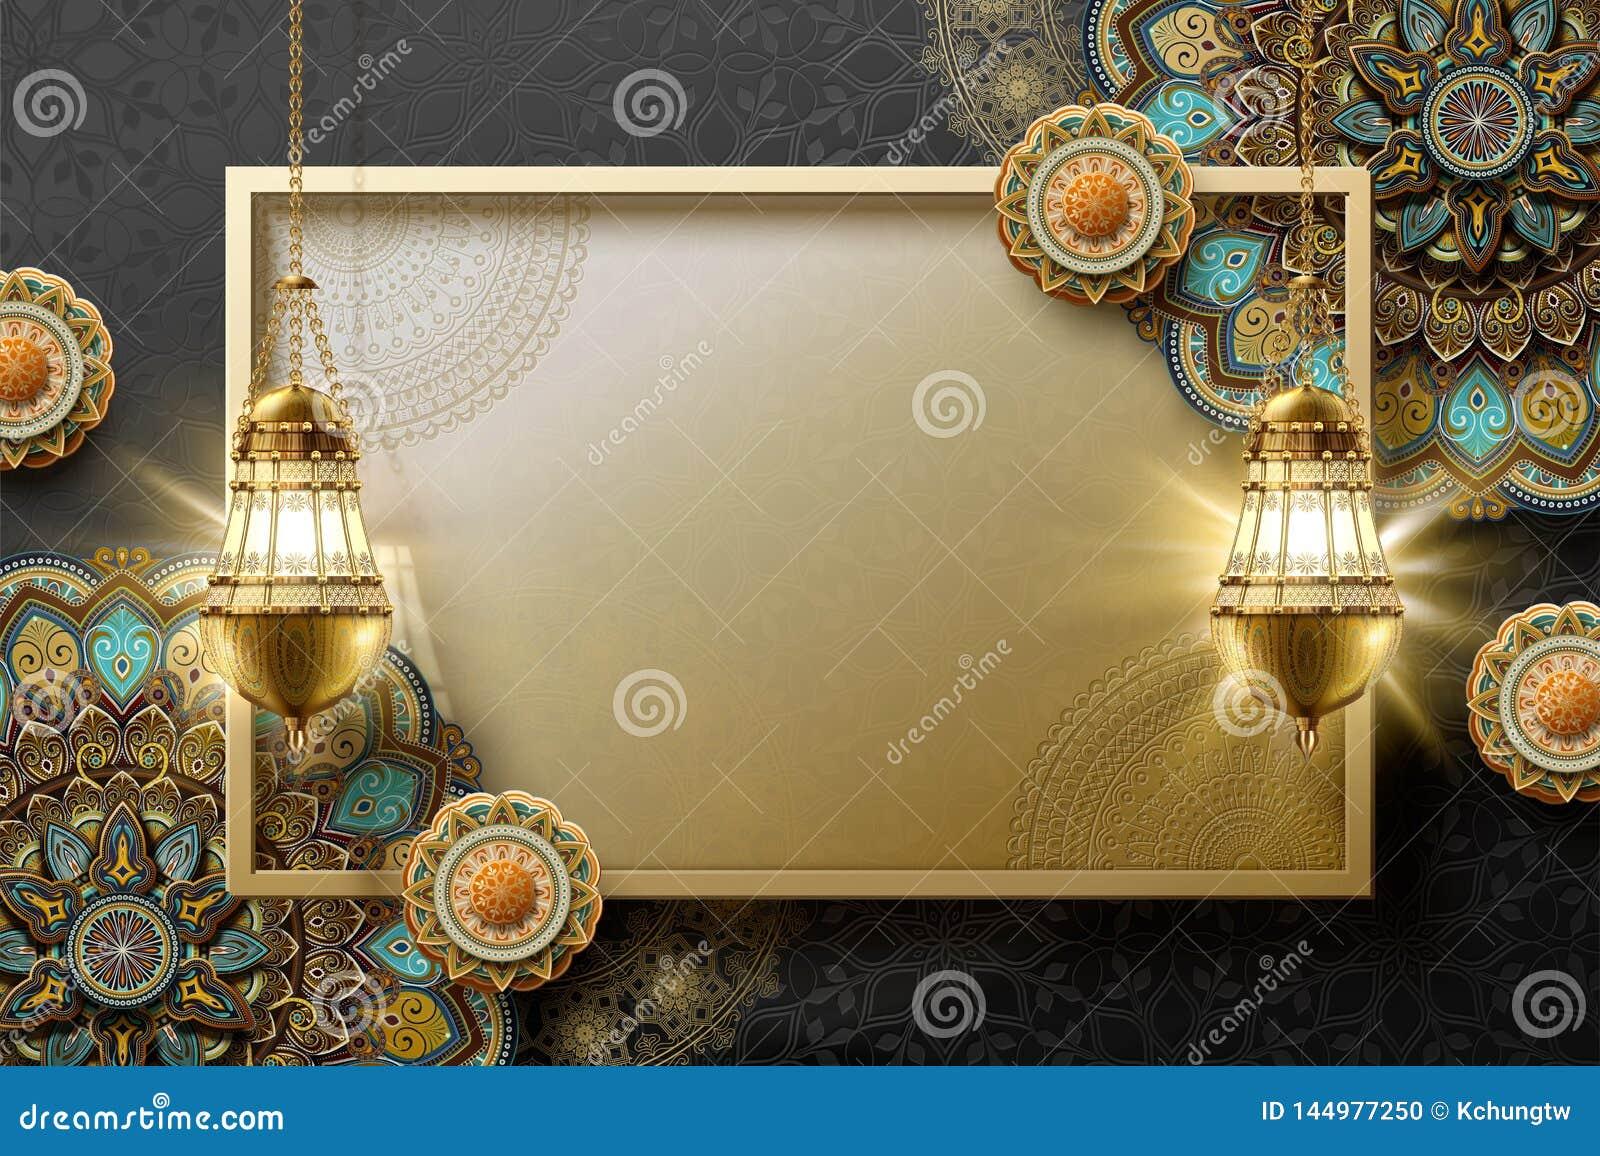 Islamic Art Background Stock Vector. Illustration Of Muslim - 144977250